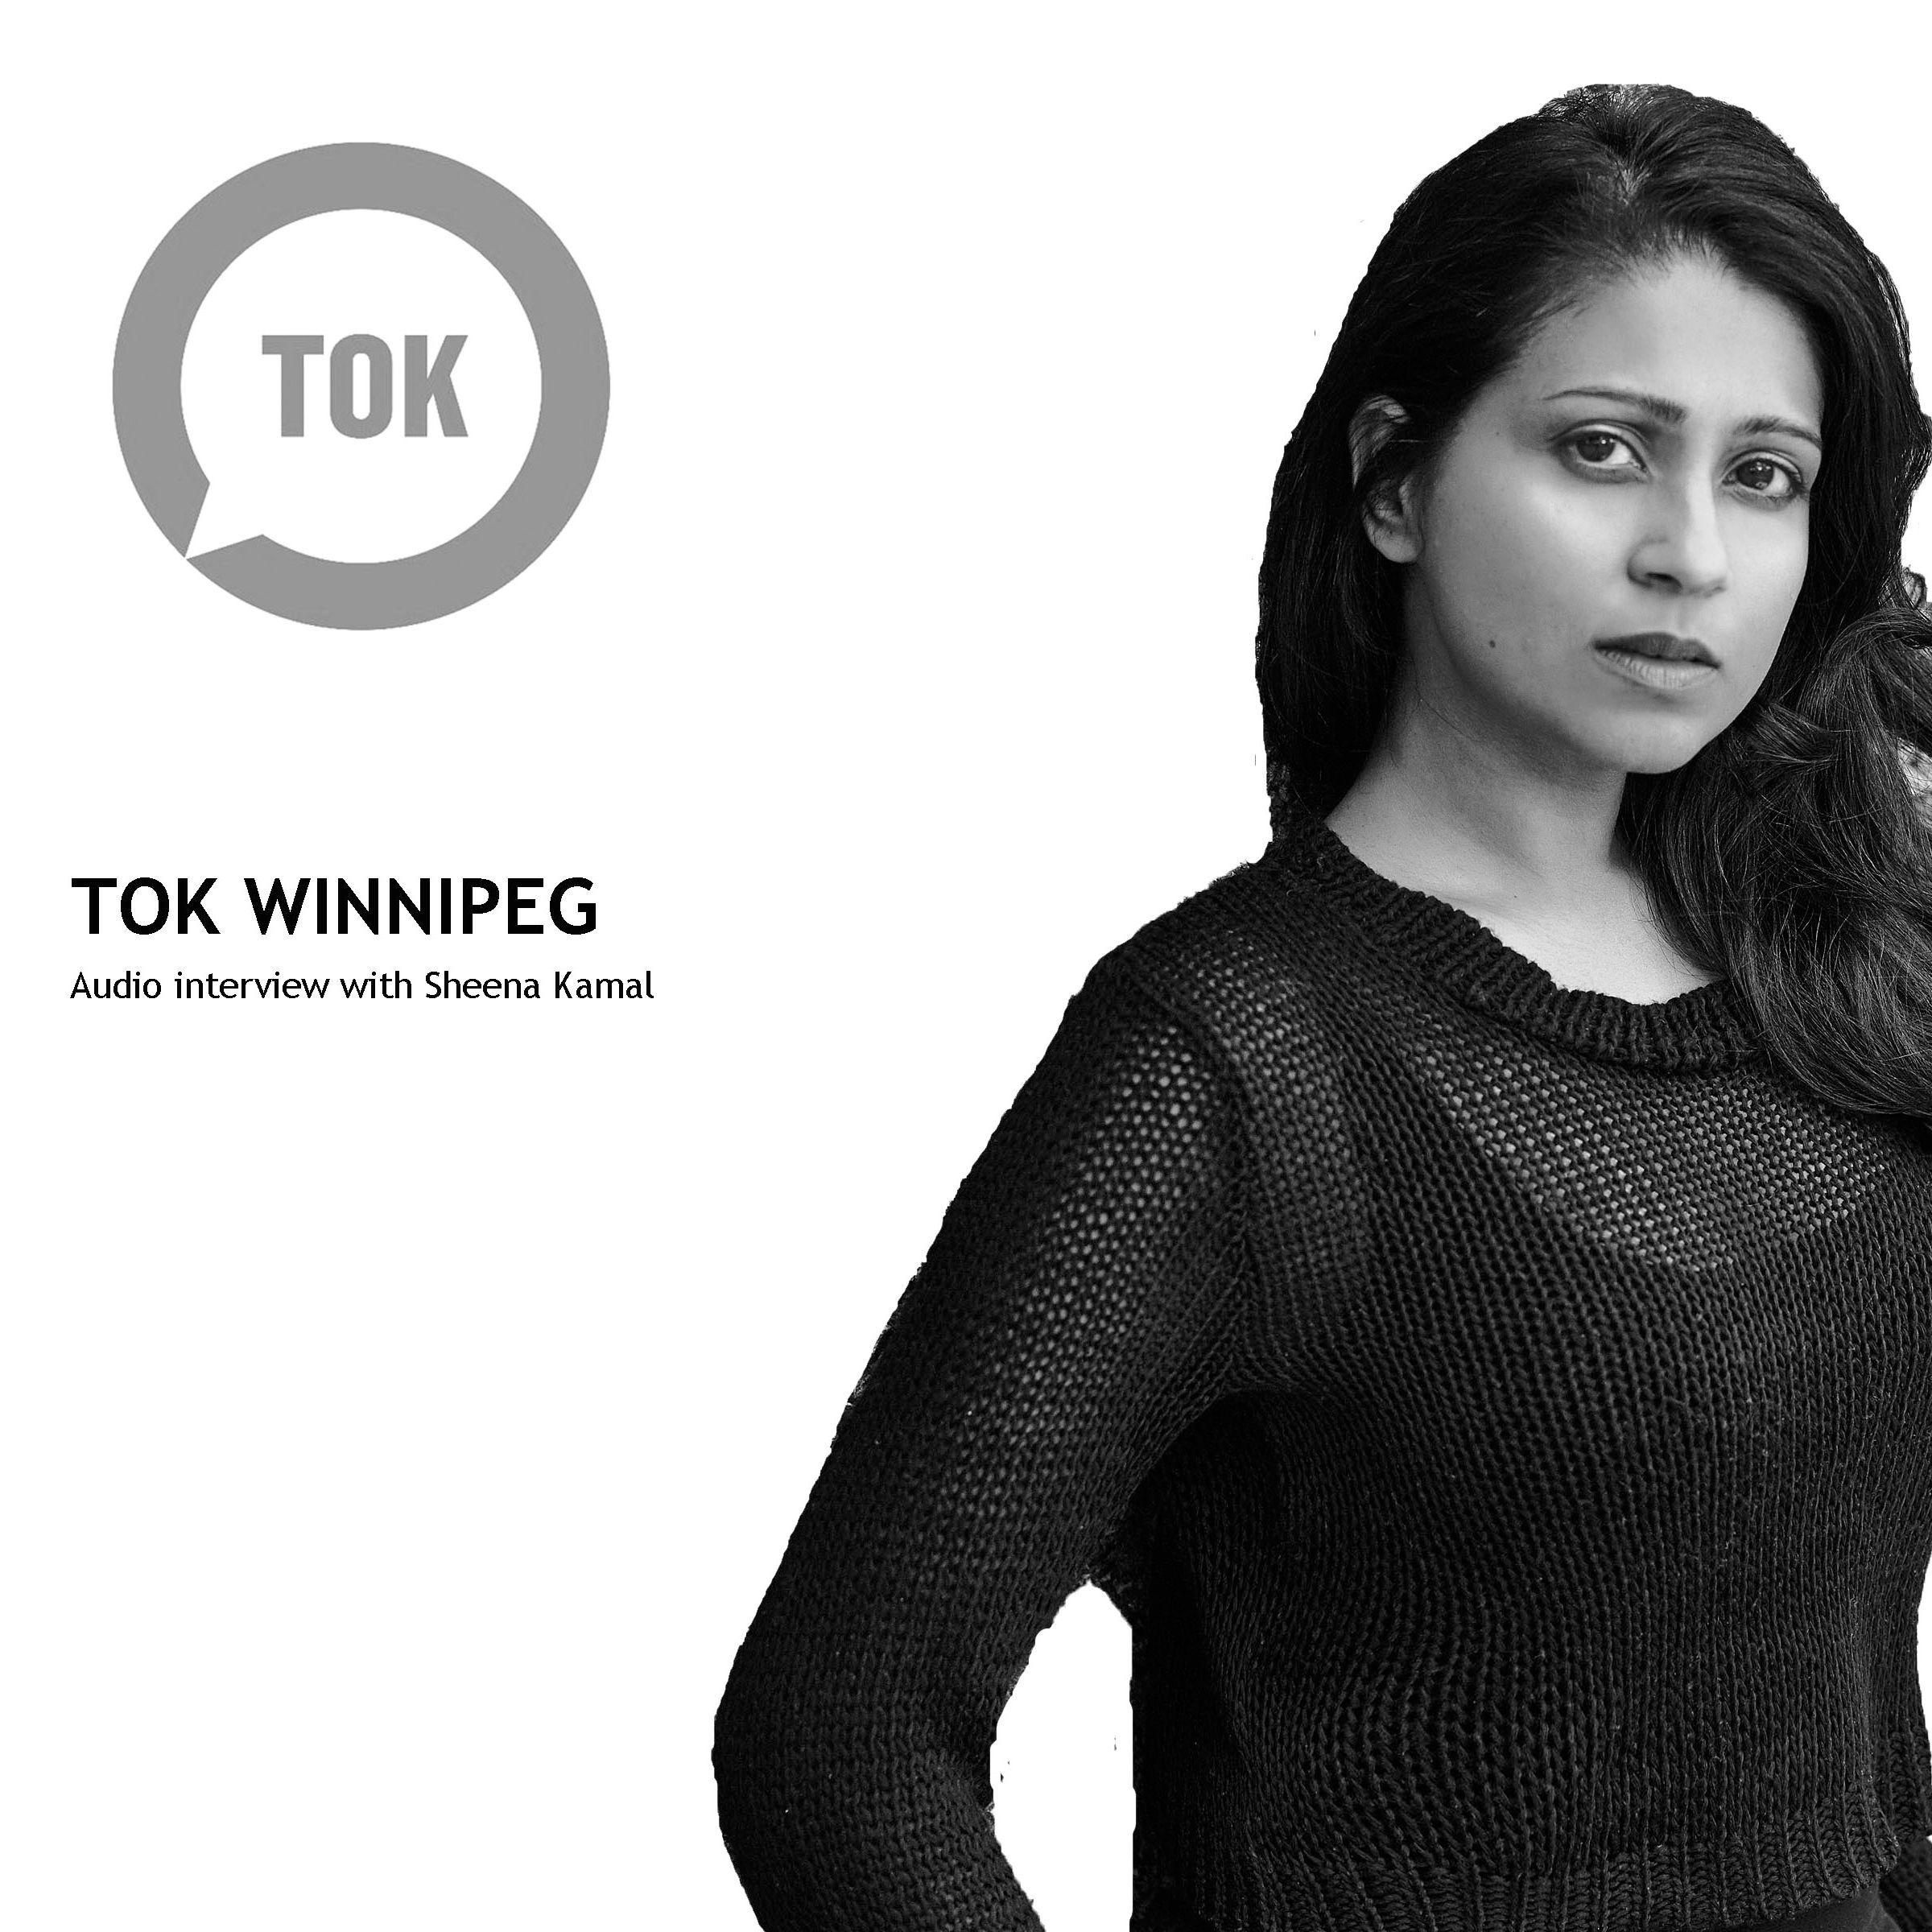 TOK Winnipeg: Sheena Kamal